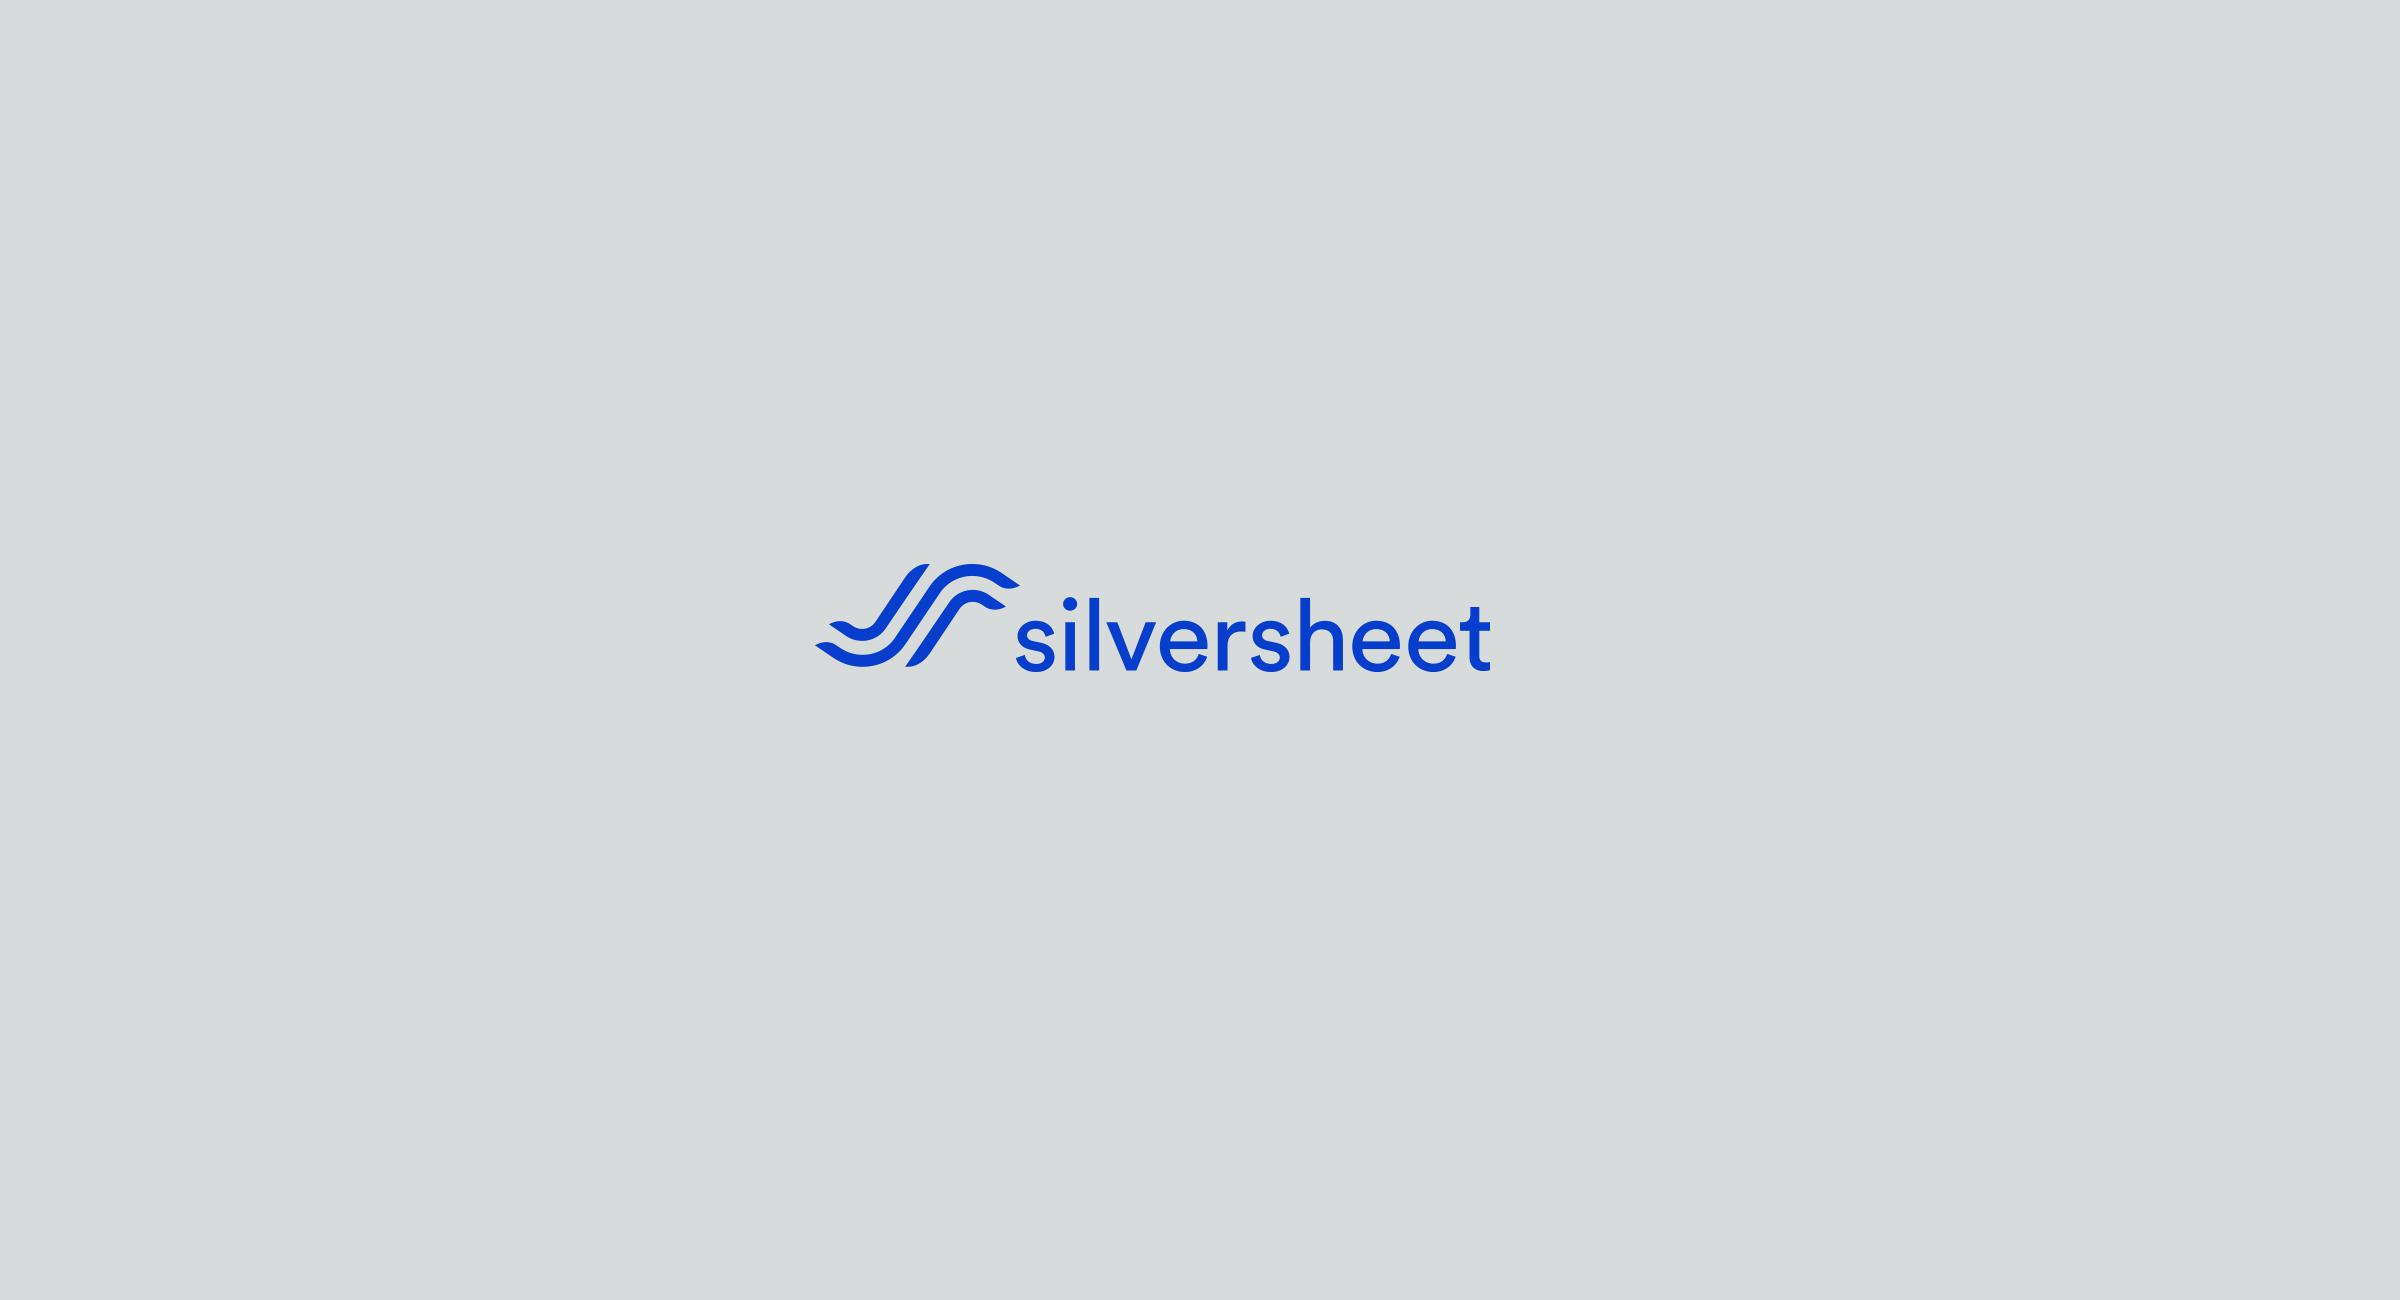 Silversheet_logo_McQuades.jpg